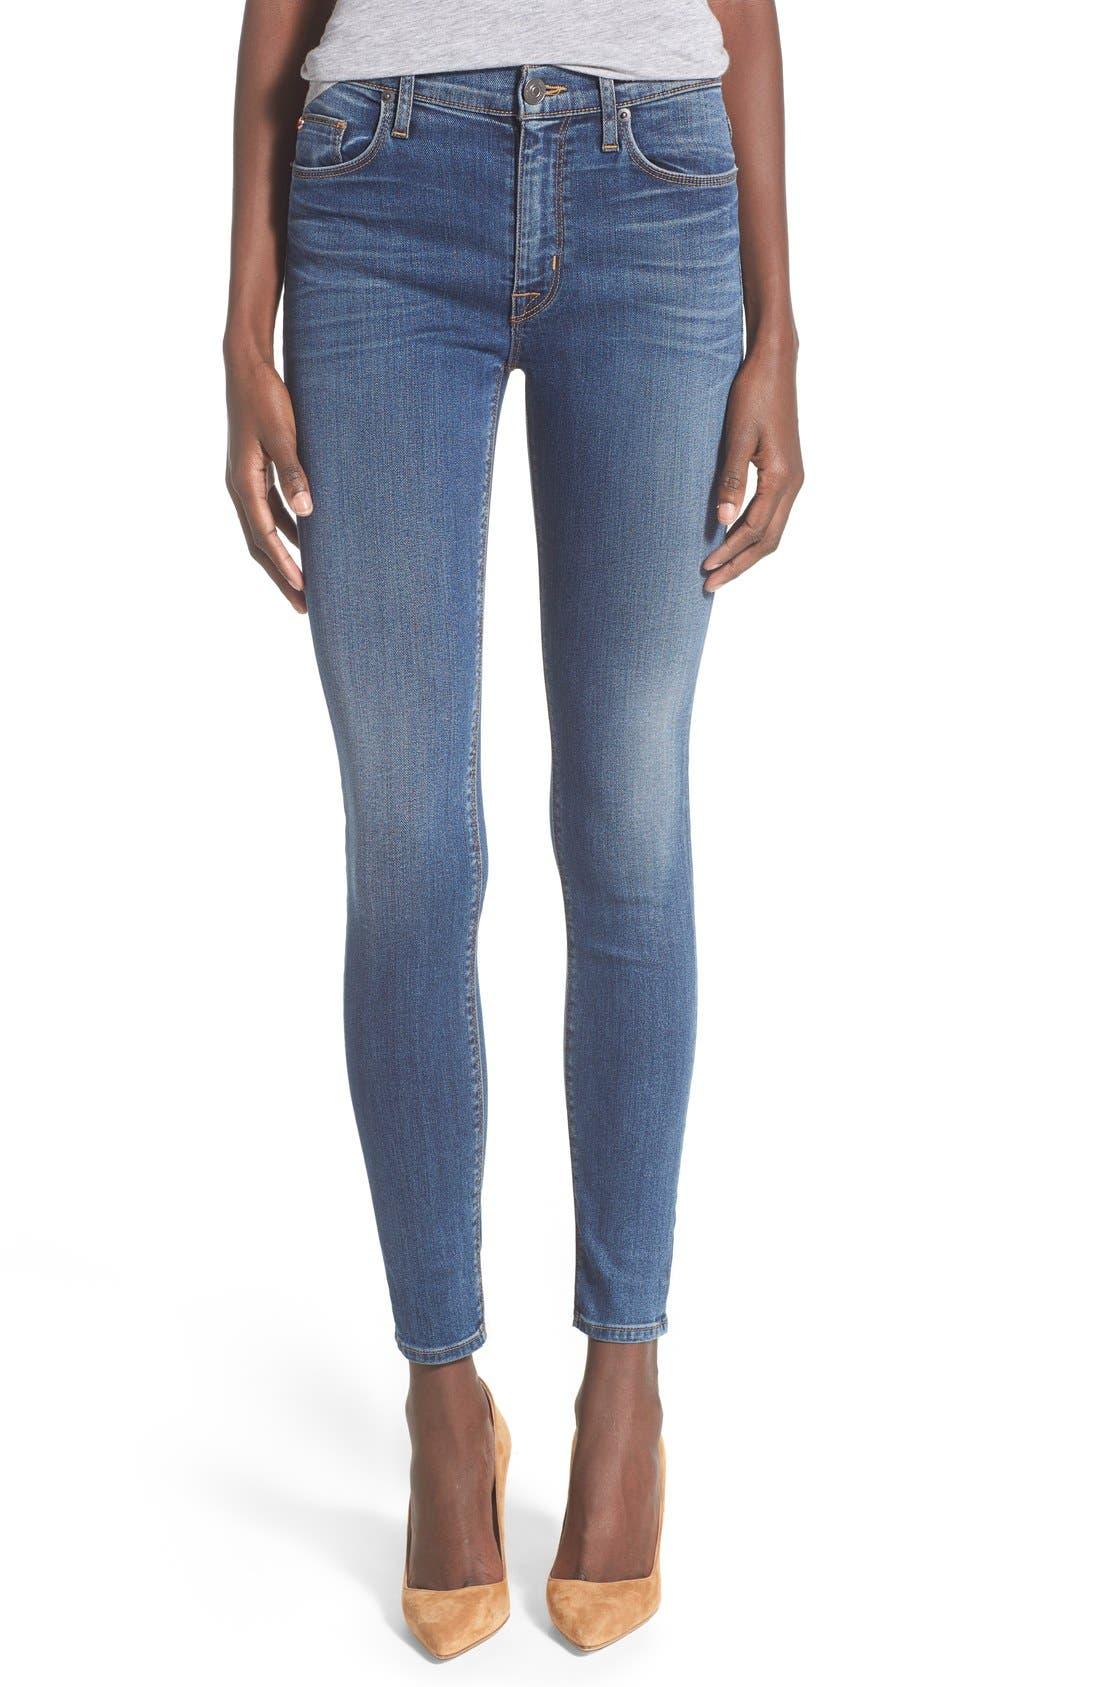 Main Image - Hudson Jeans 'Barbara' High Rise Skinny Jeans